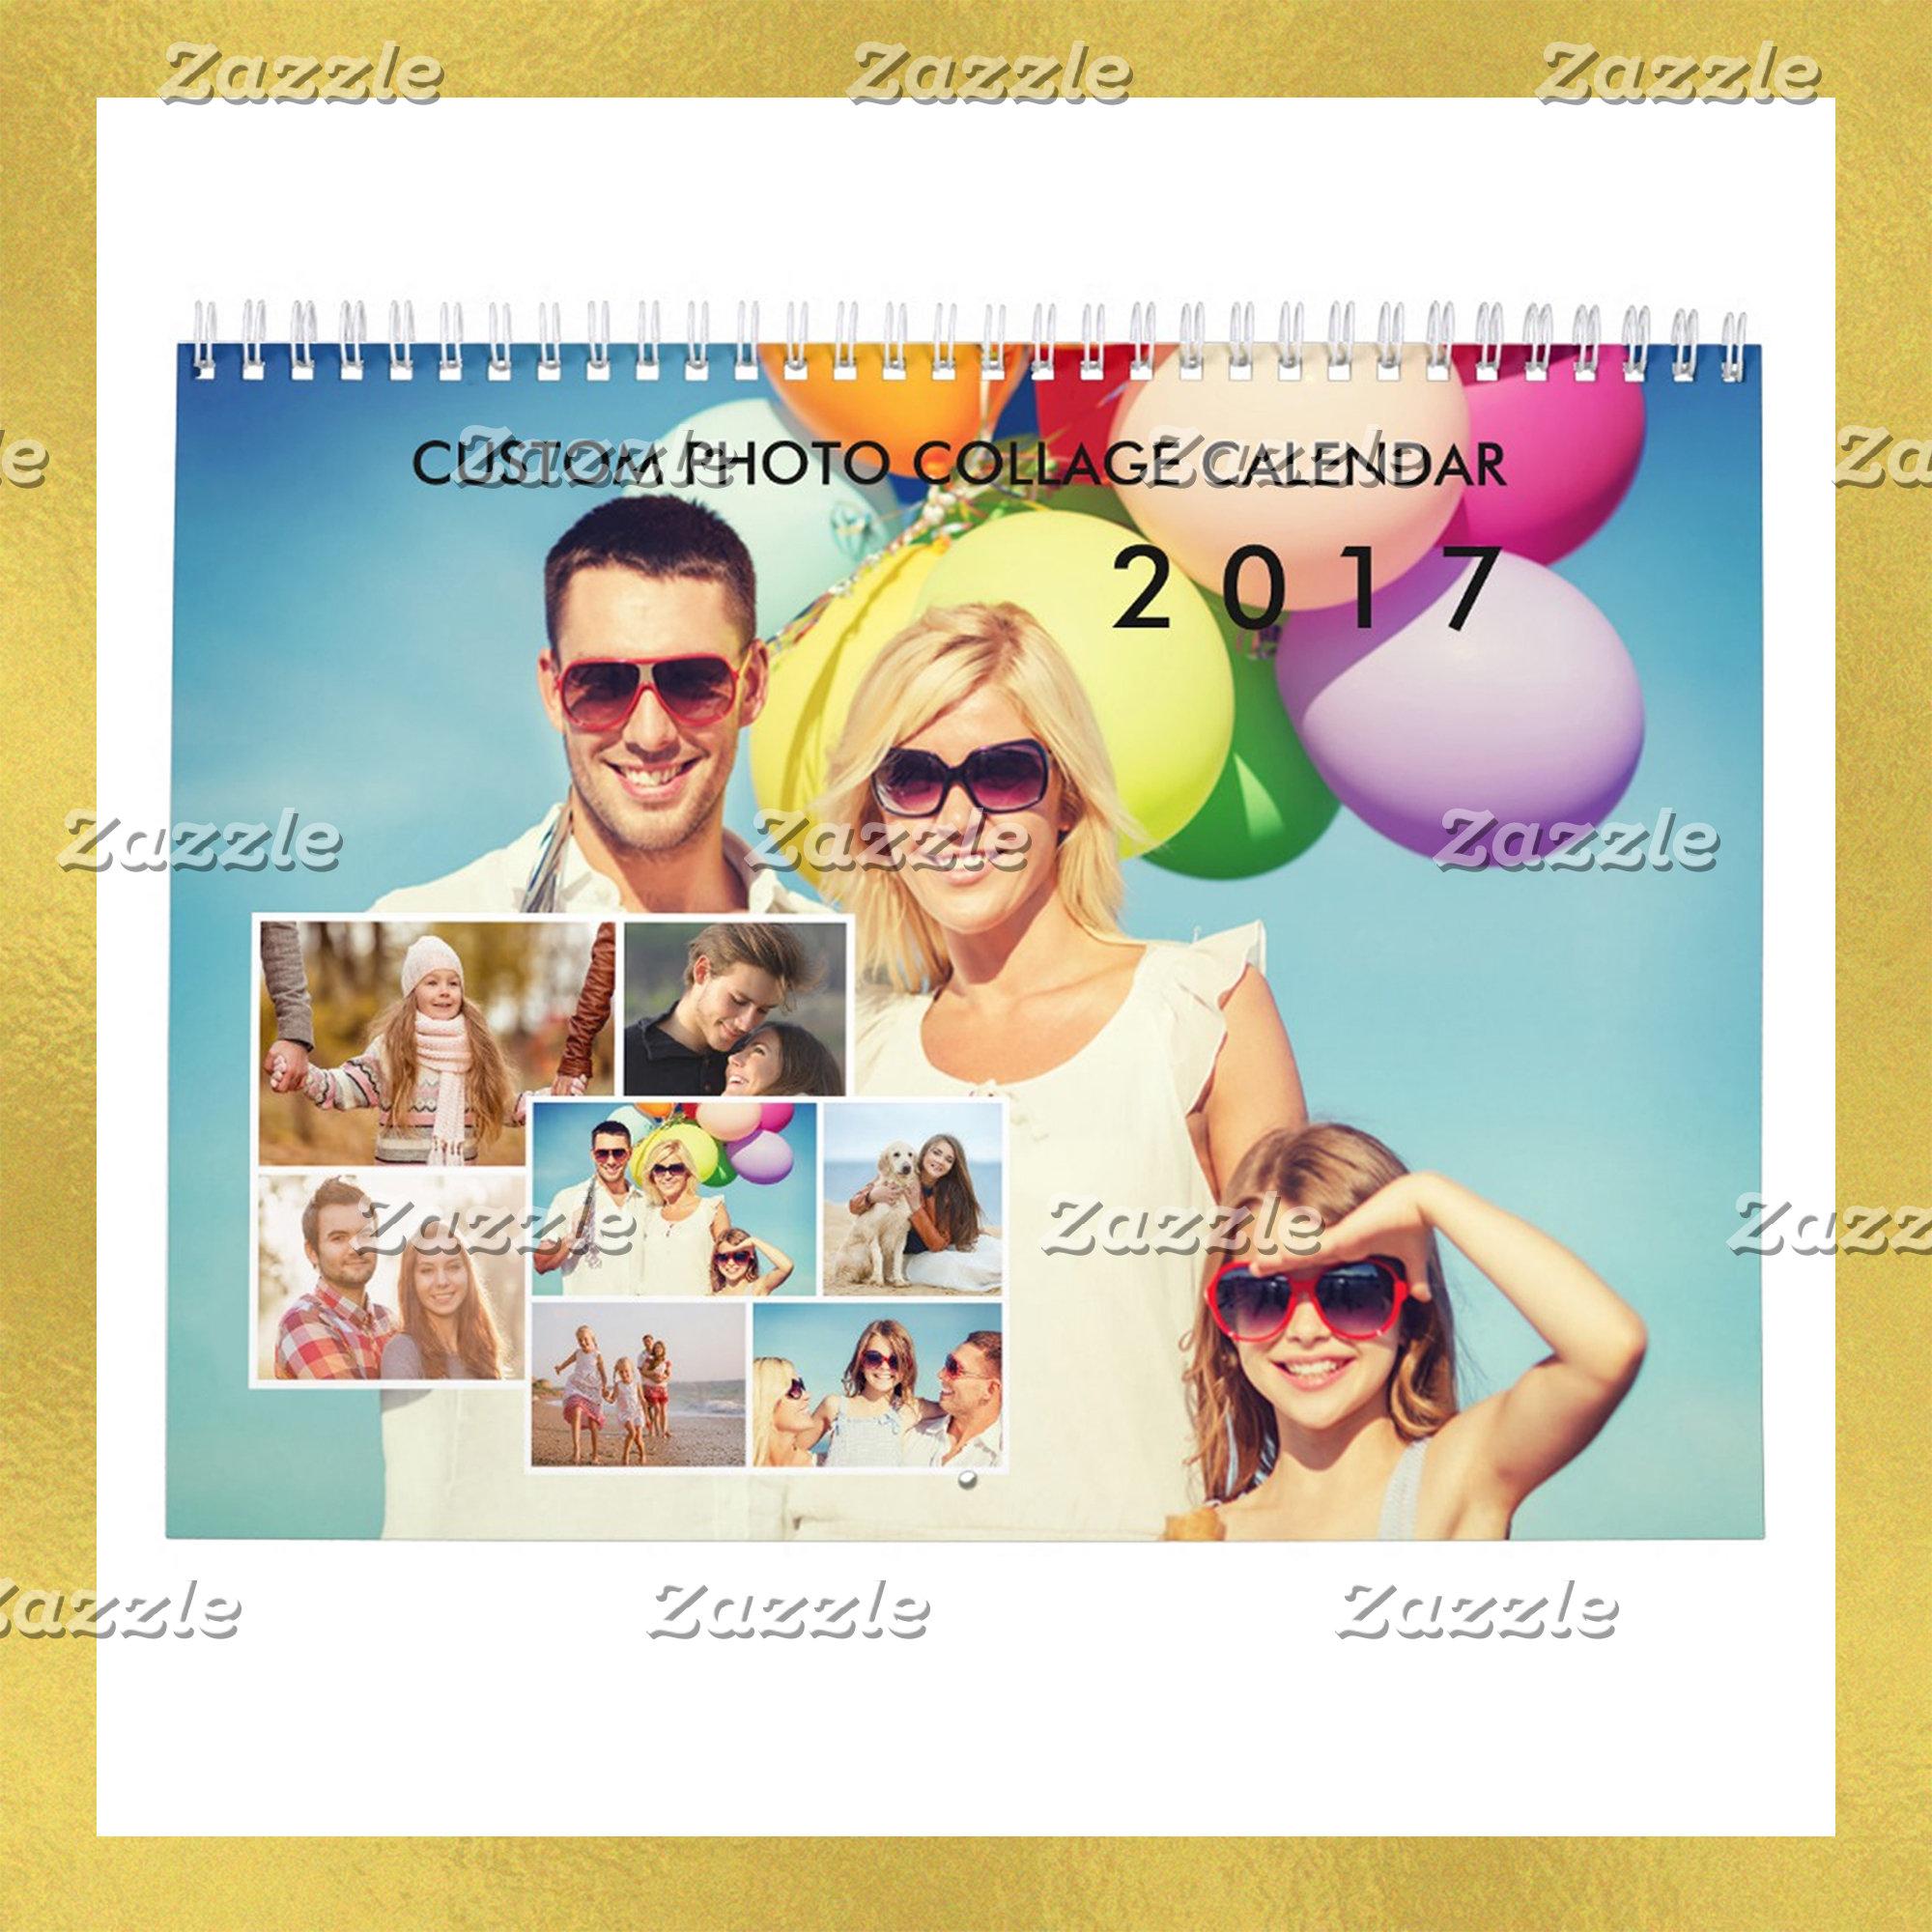 2017 Calendars